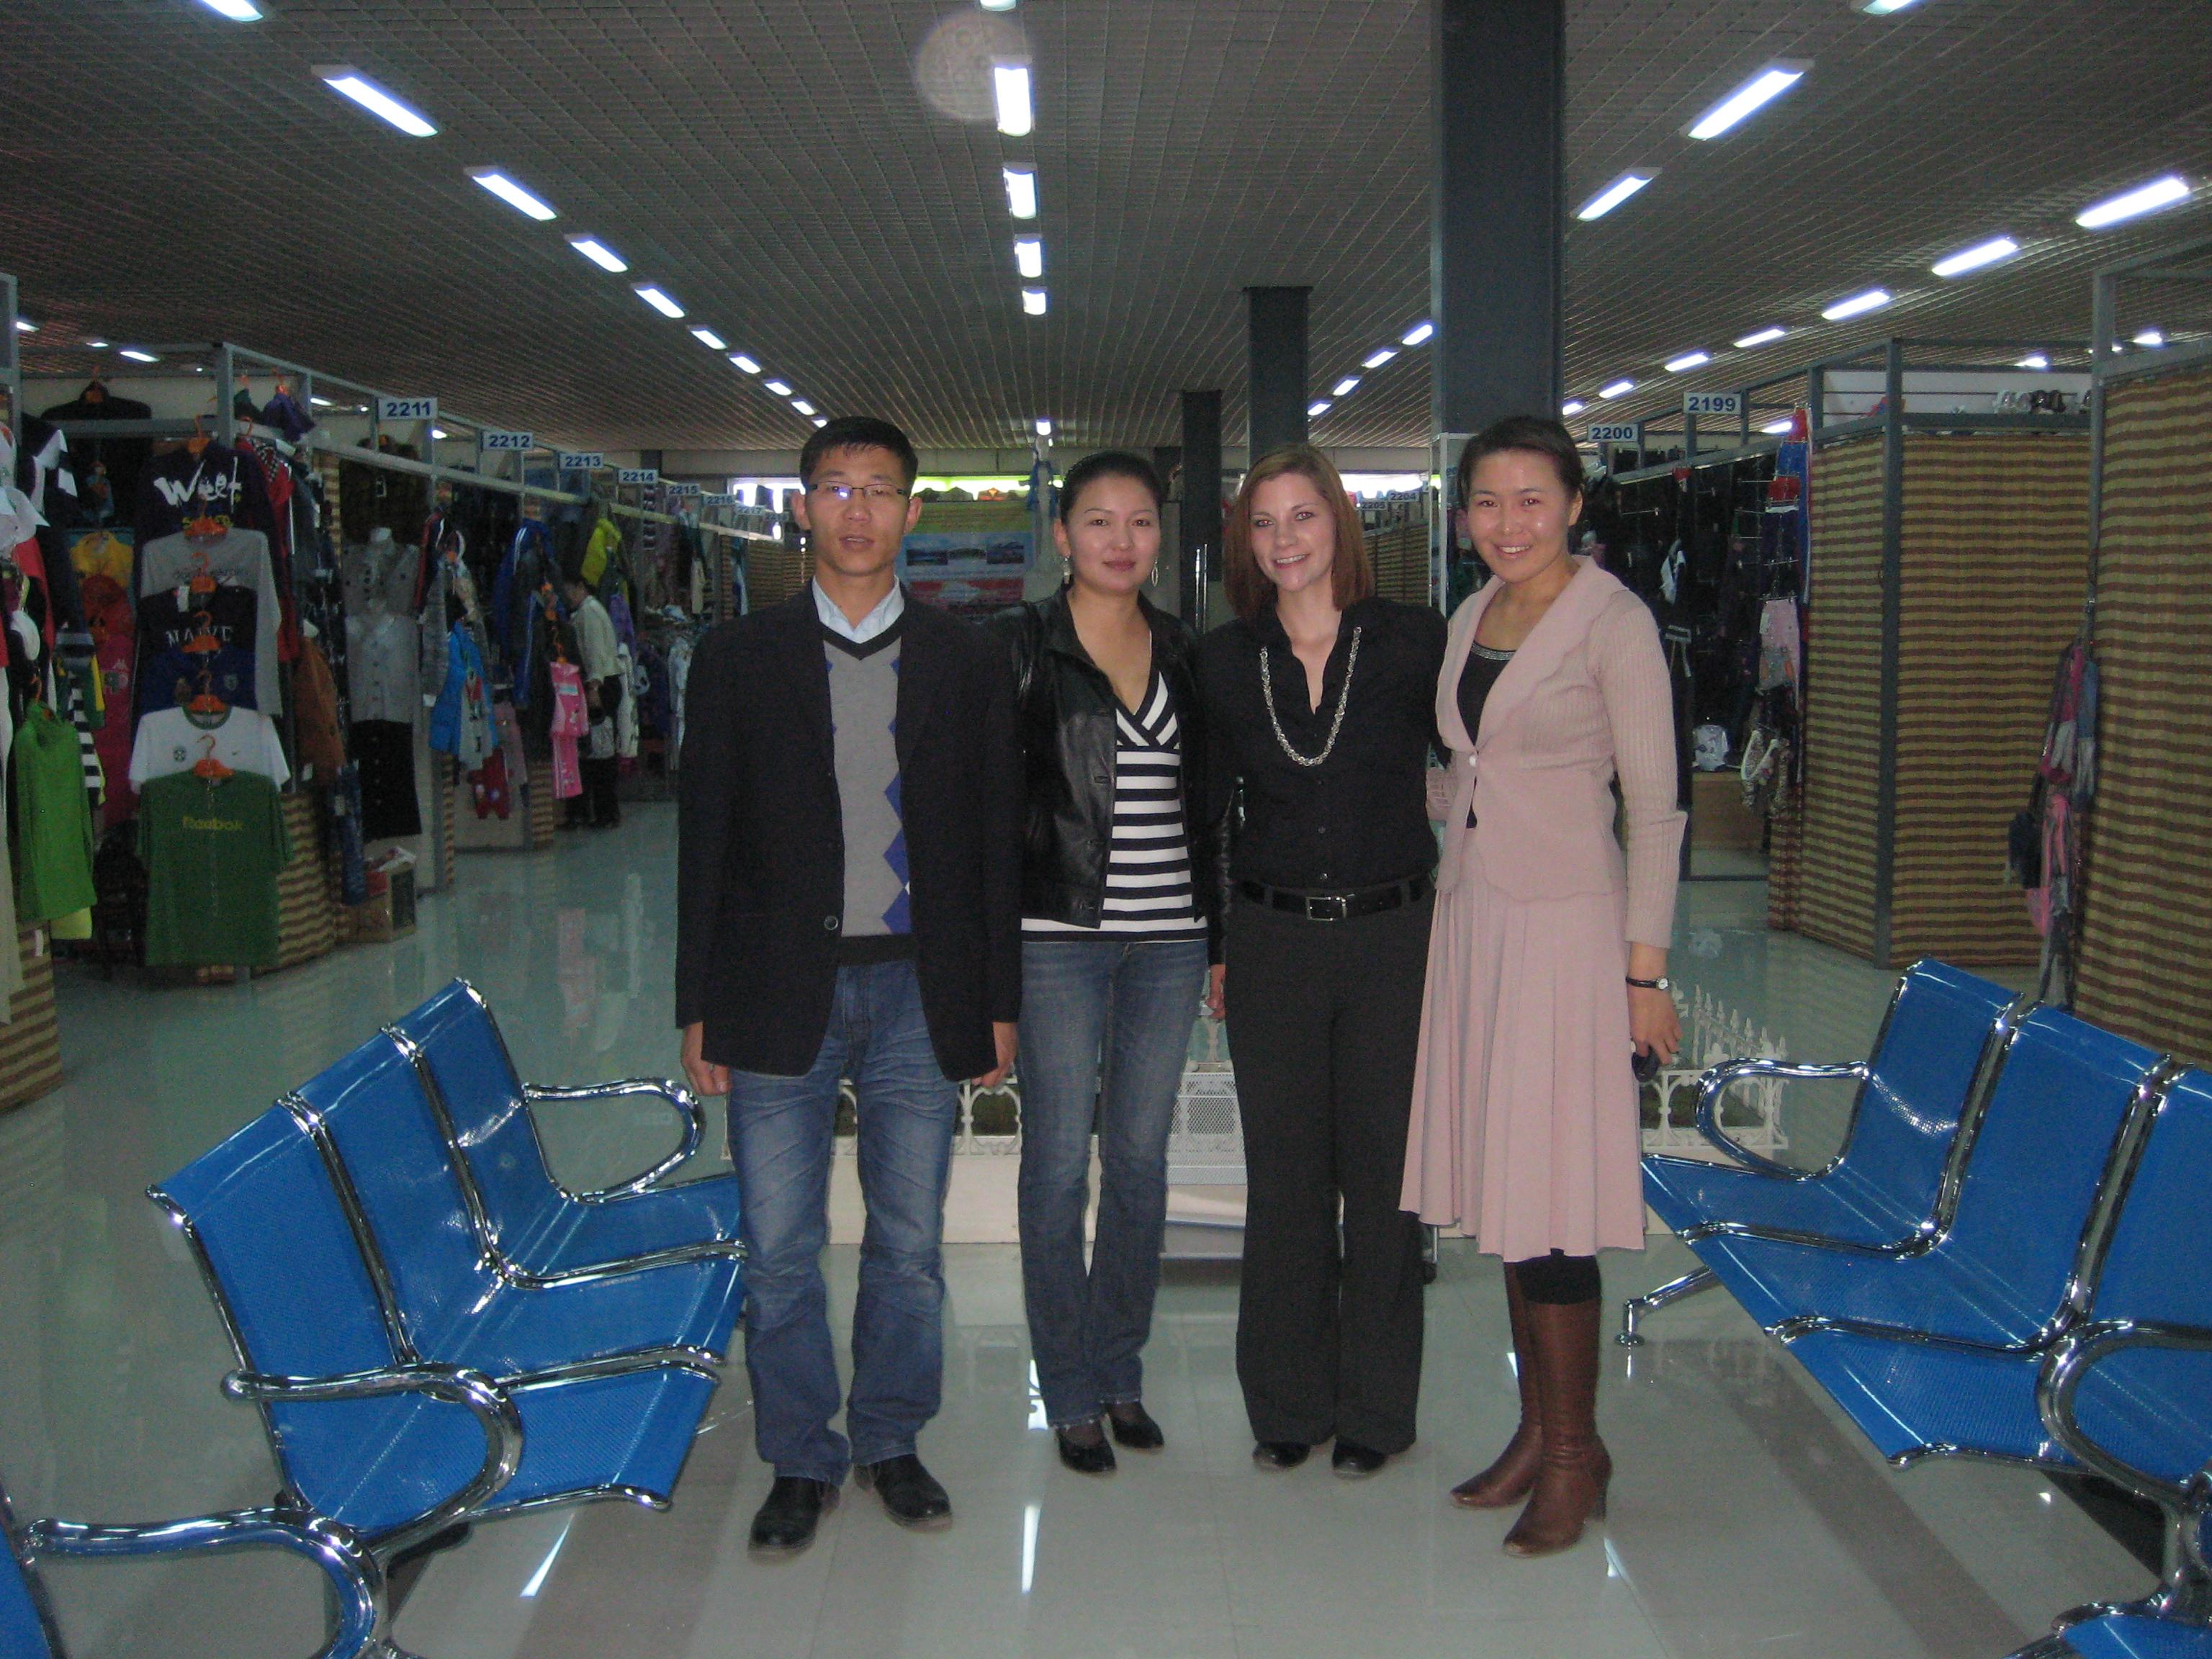 A new indoor market in Bayankhongor, Bayankhongor province